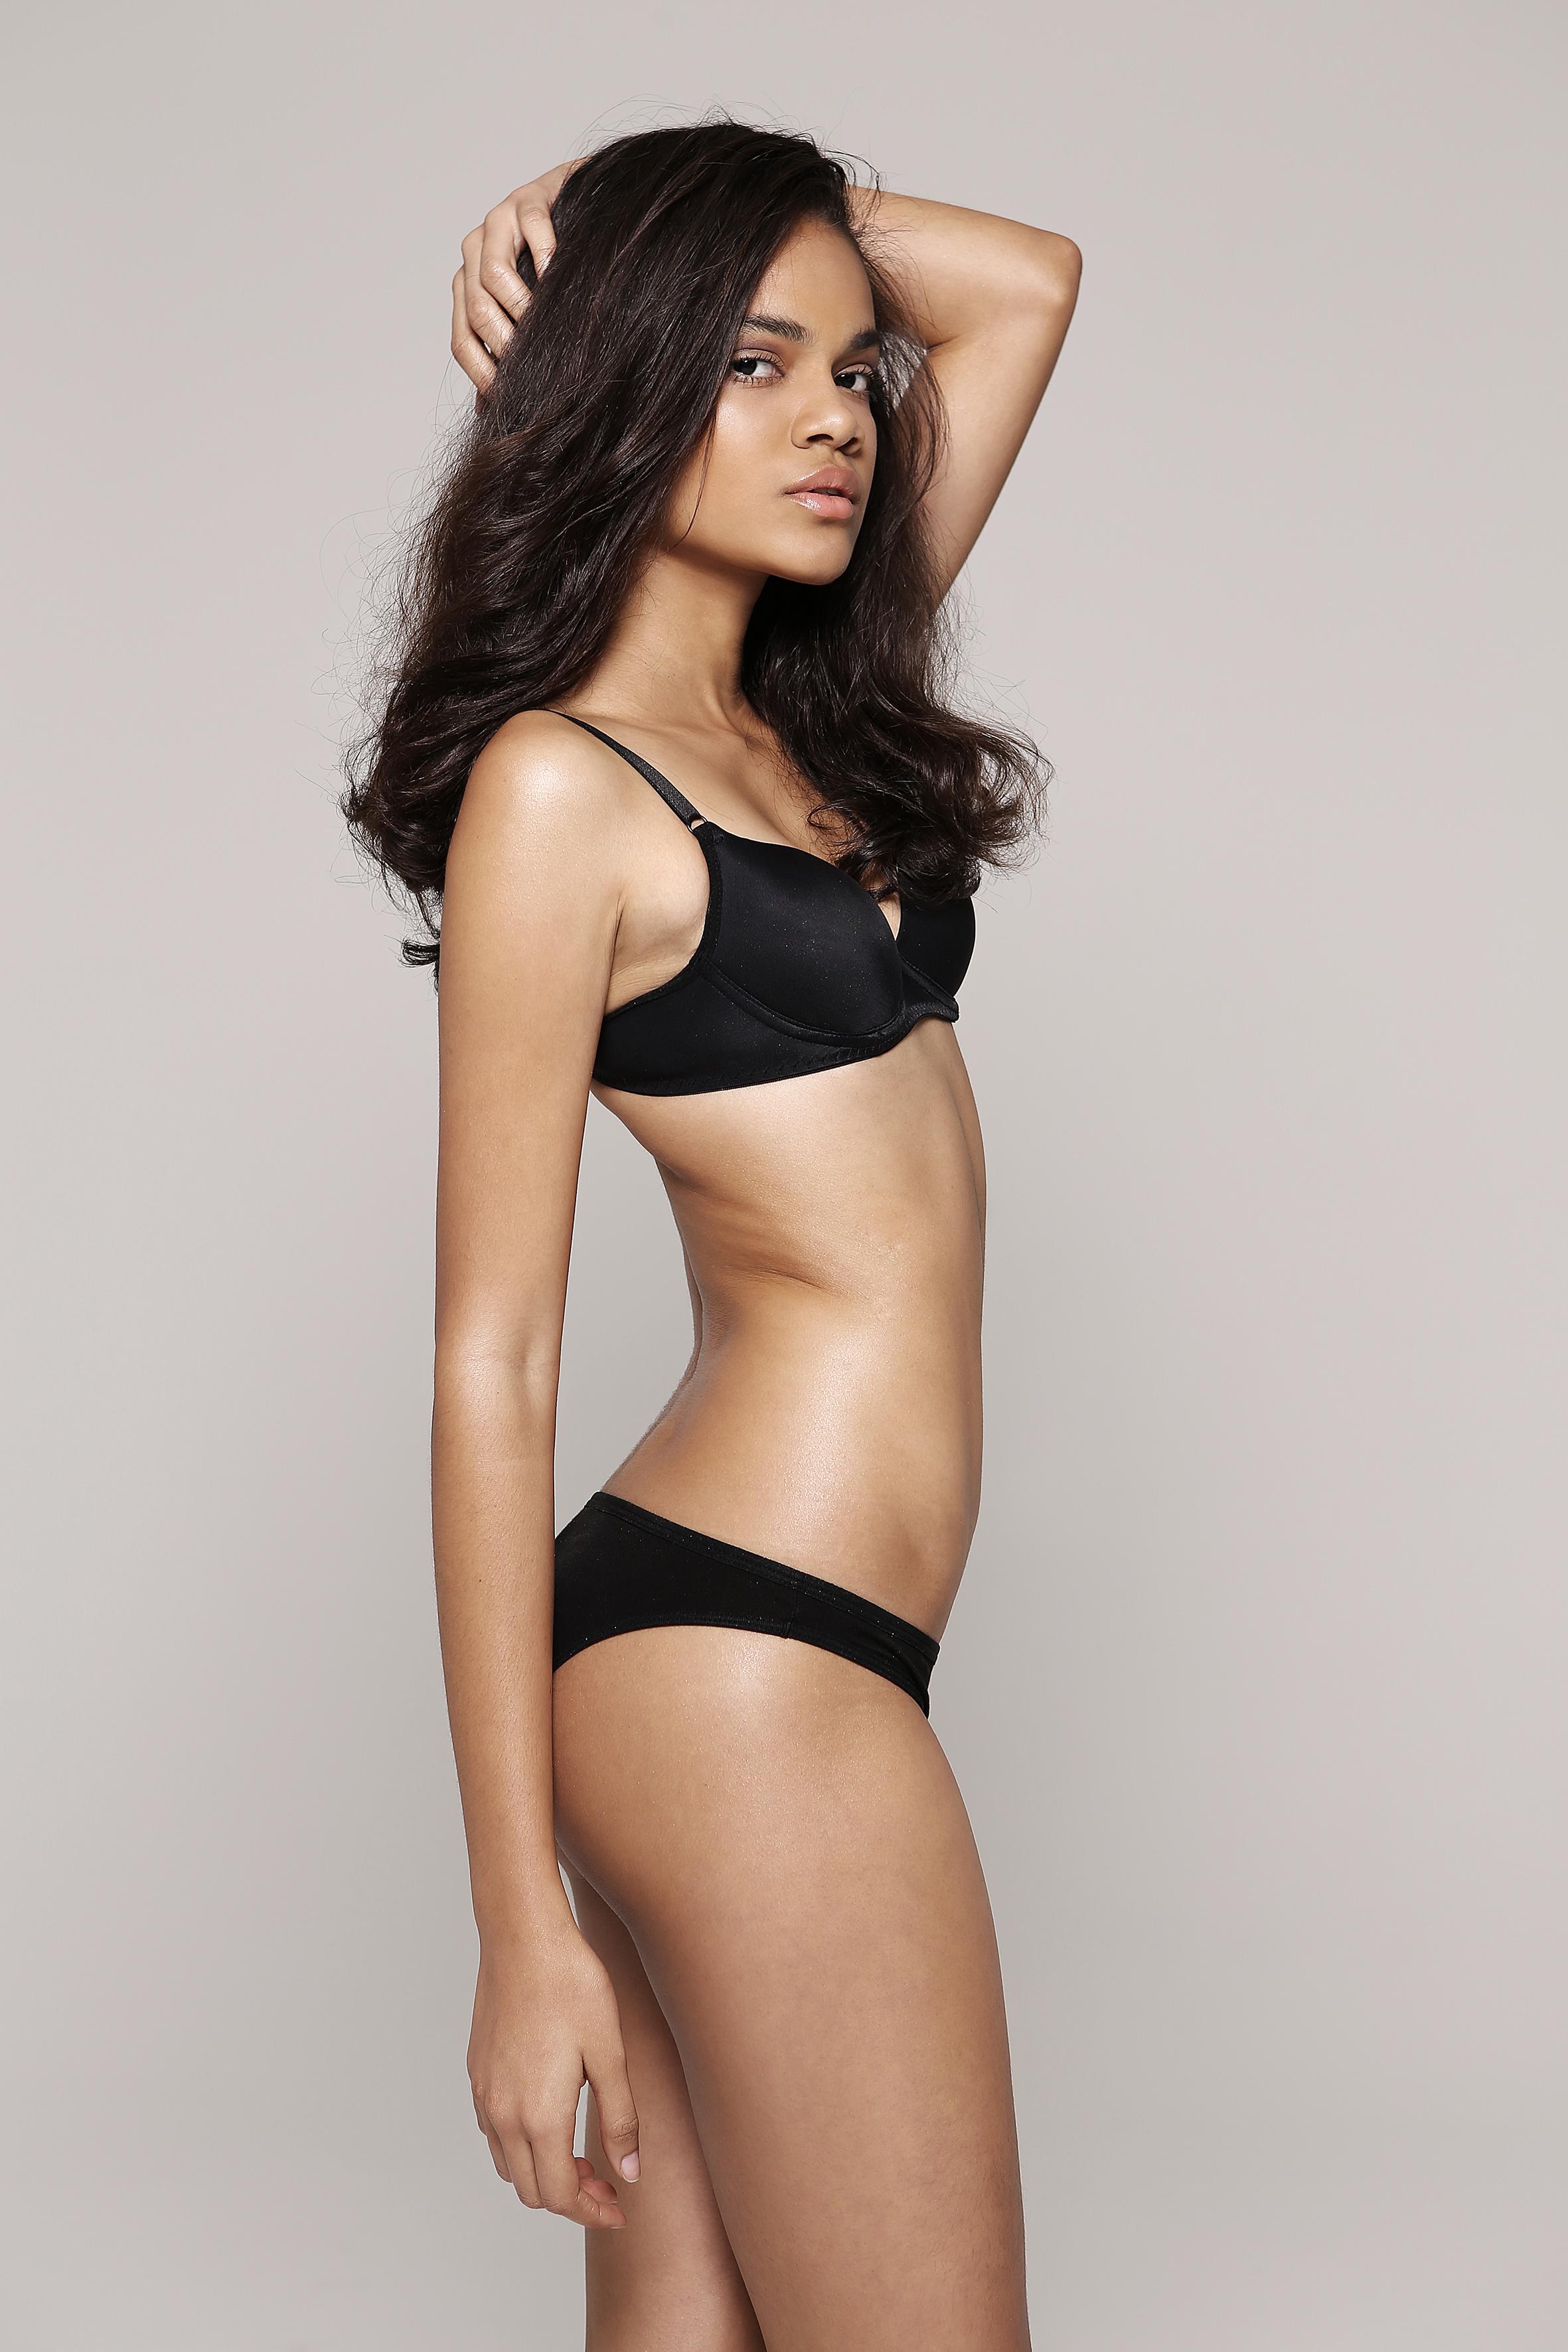 Aricia Lima para way model